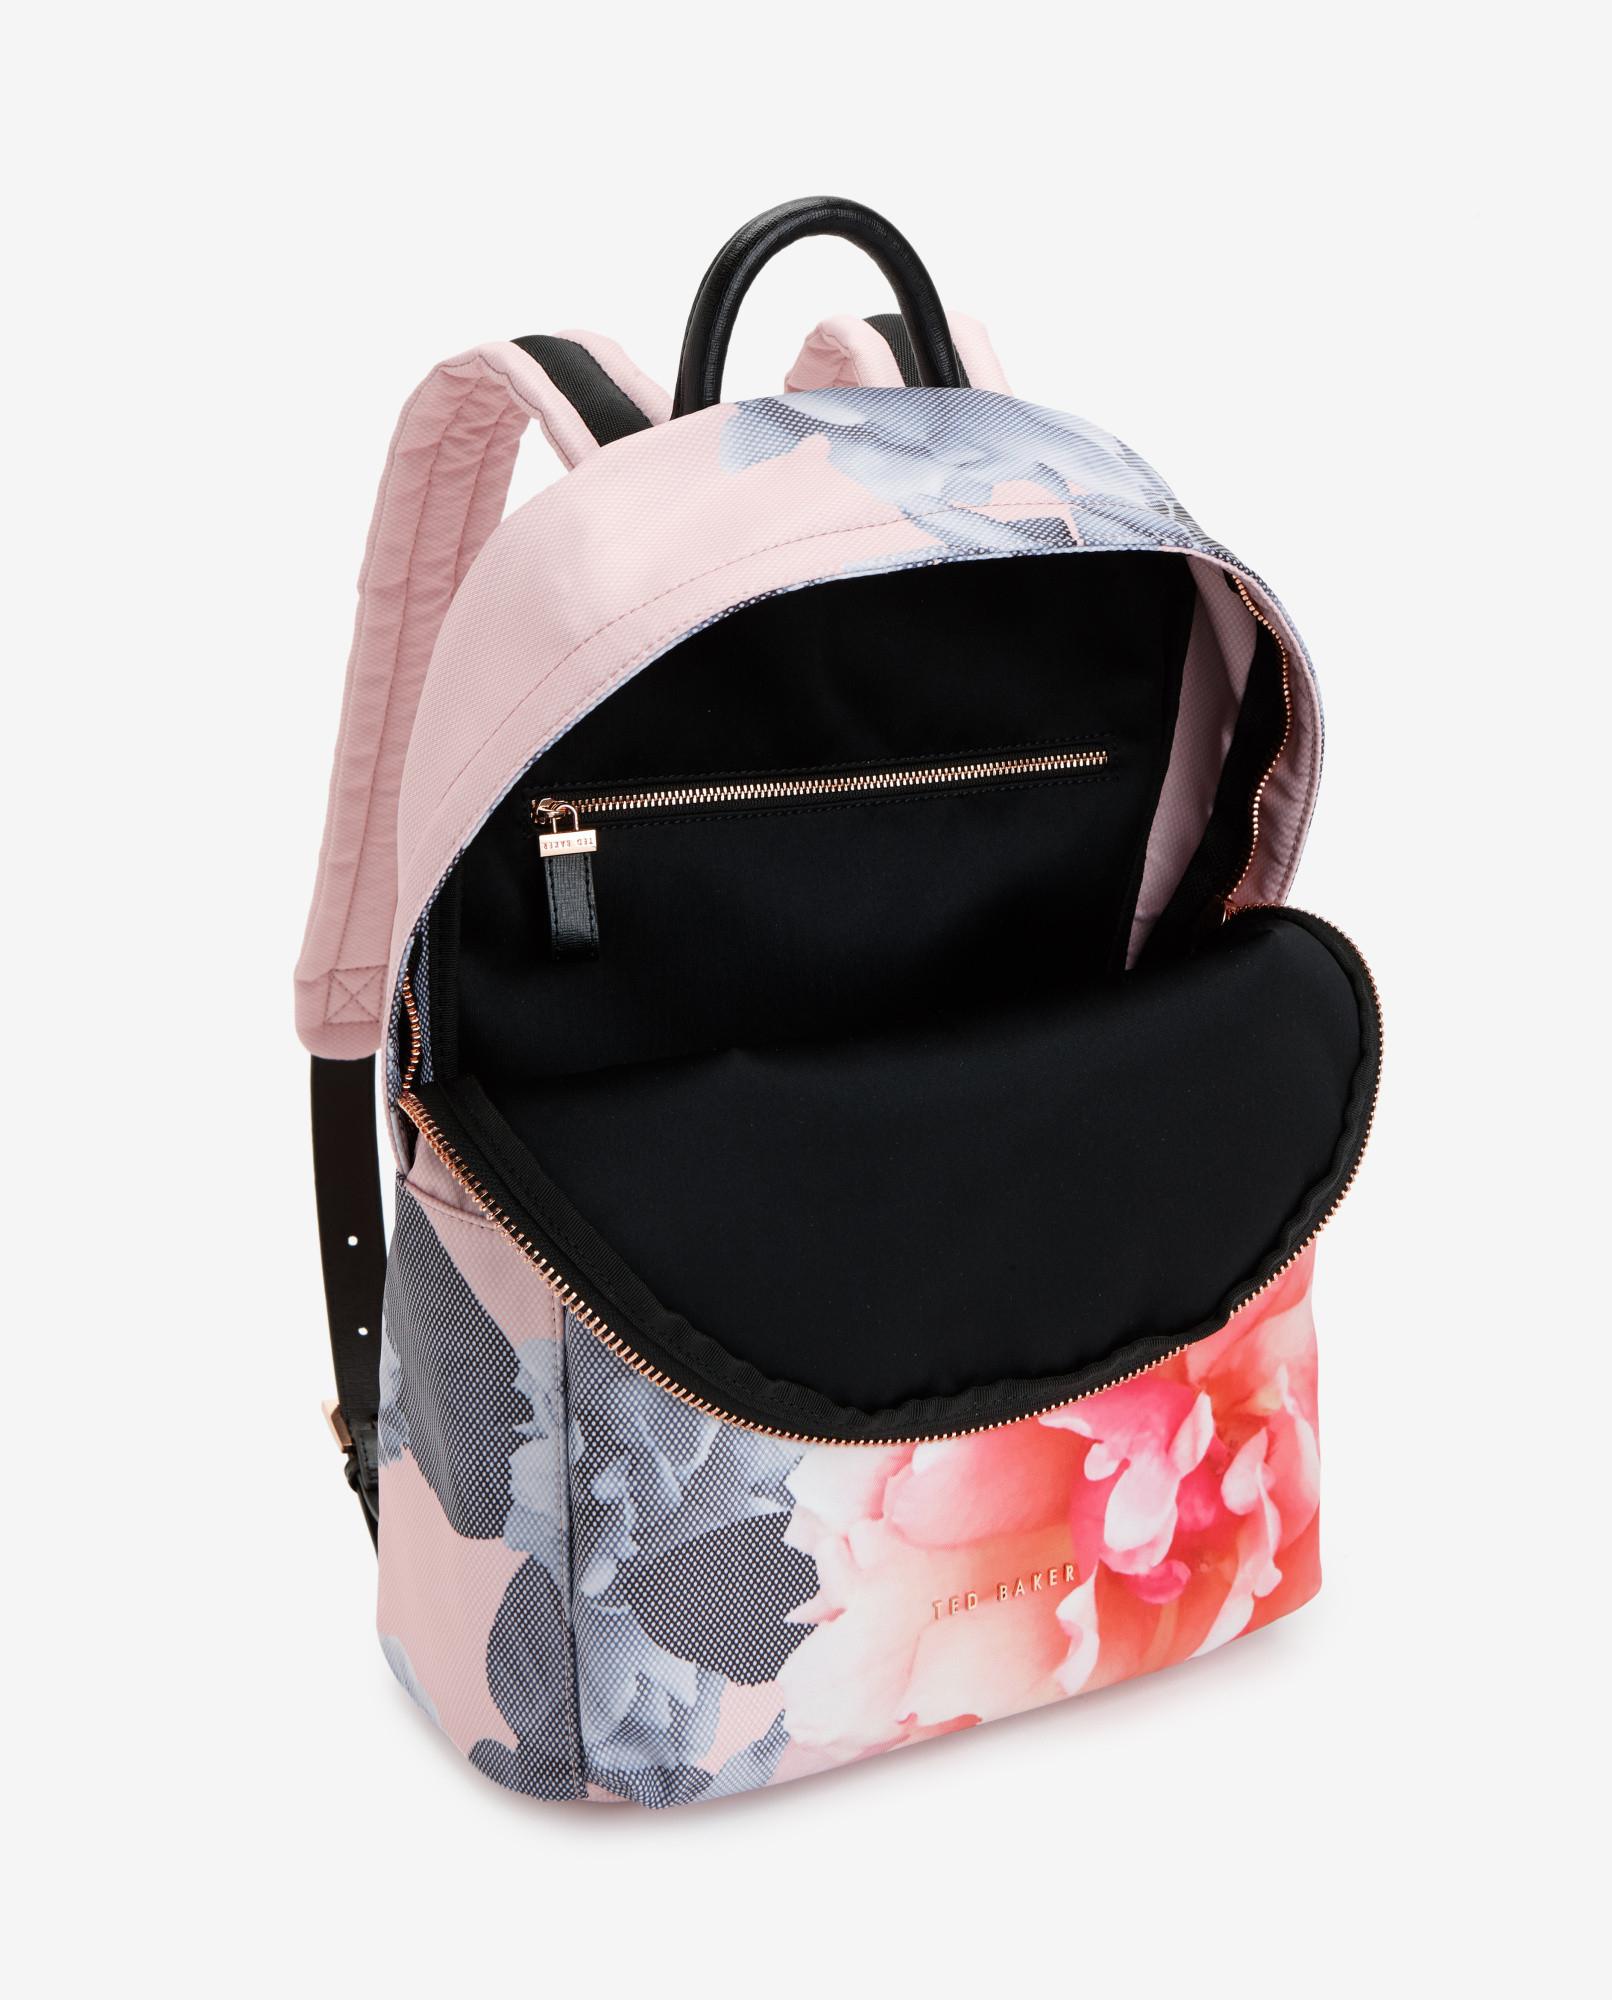 ted baker monorose print backpack in multicolor nude pink. Black Bedroom Furniture Sets. Home Design Ideas